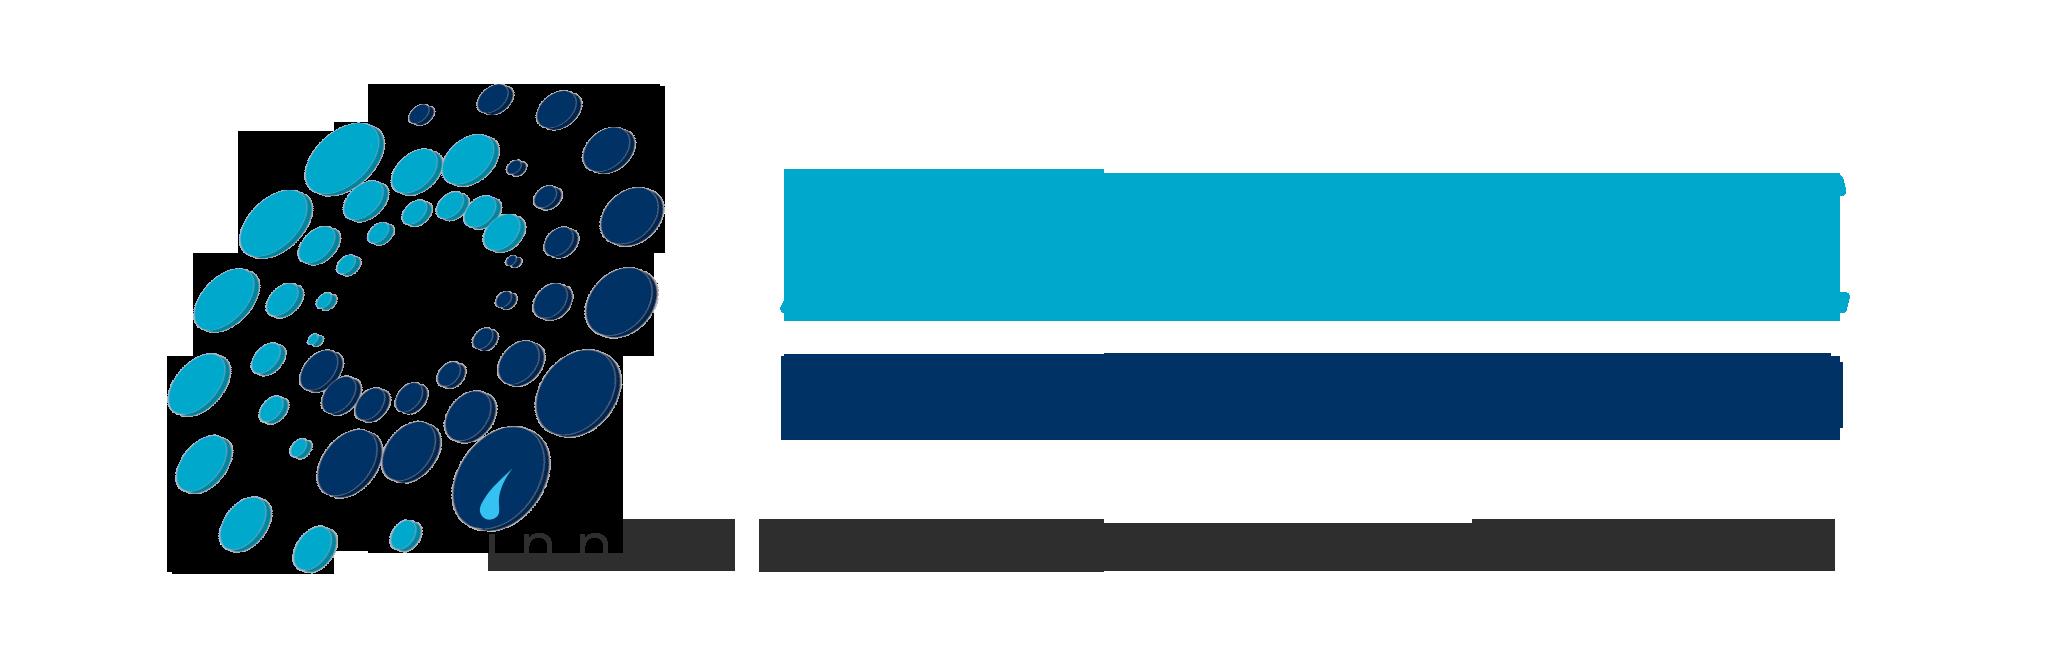 AMPHITRITE TECHNOLOGIES PVT LTD